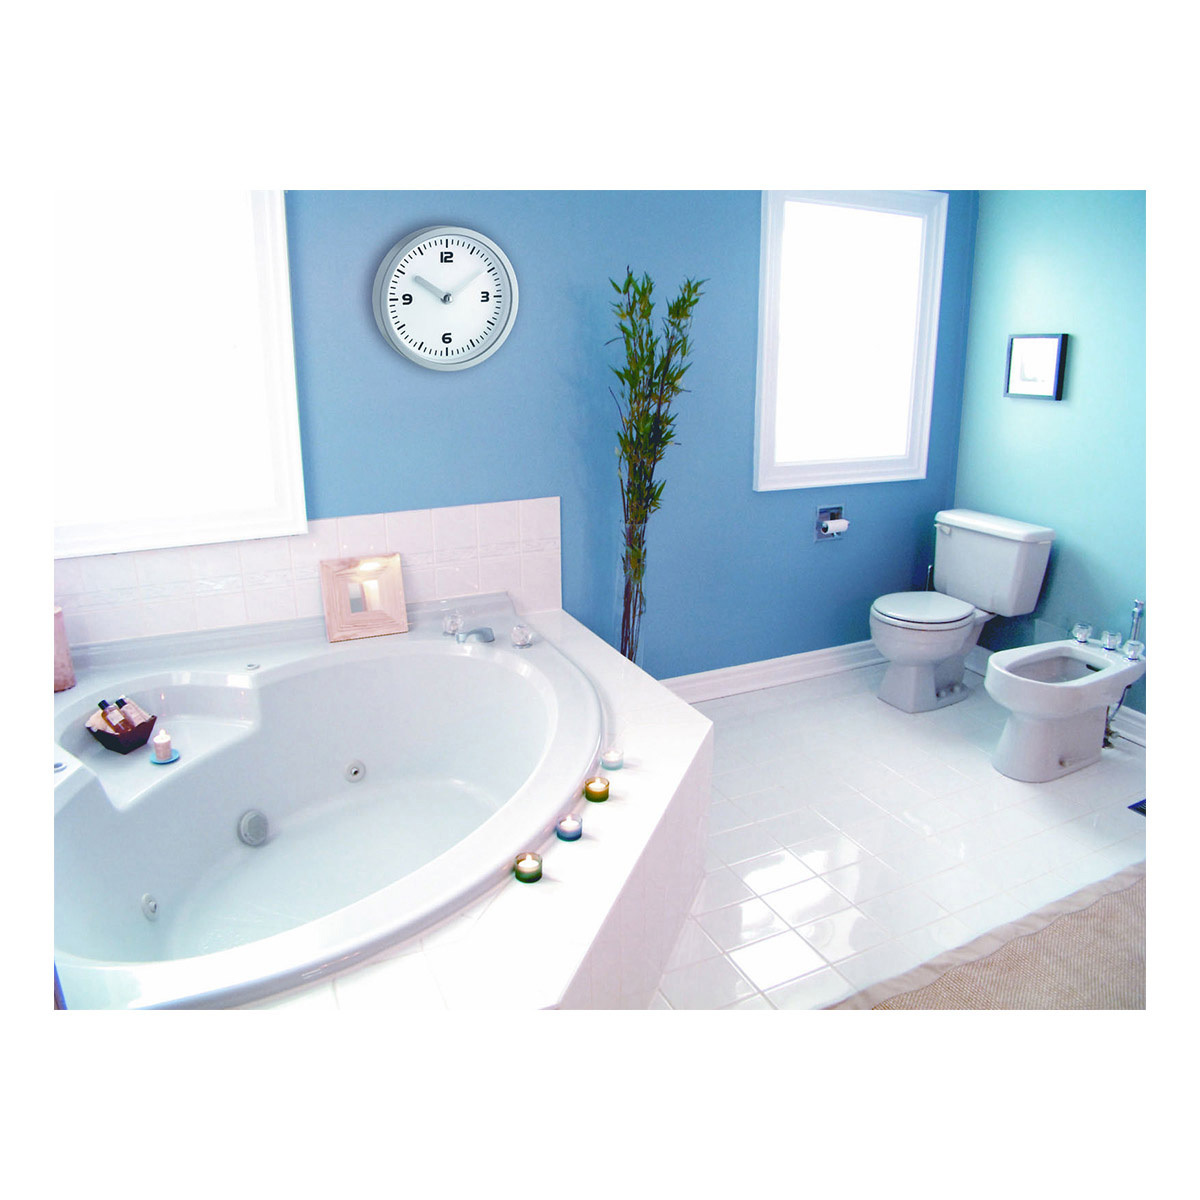 60-3012-analoge-badezimmeruhr-anwendung-1200x1200px.jpg